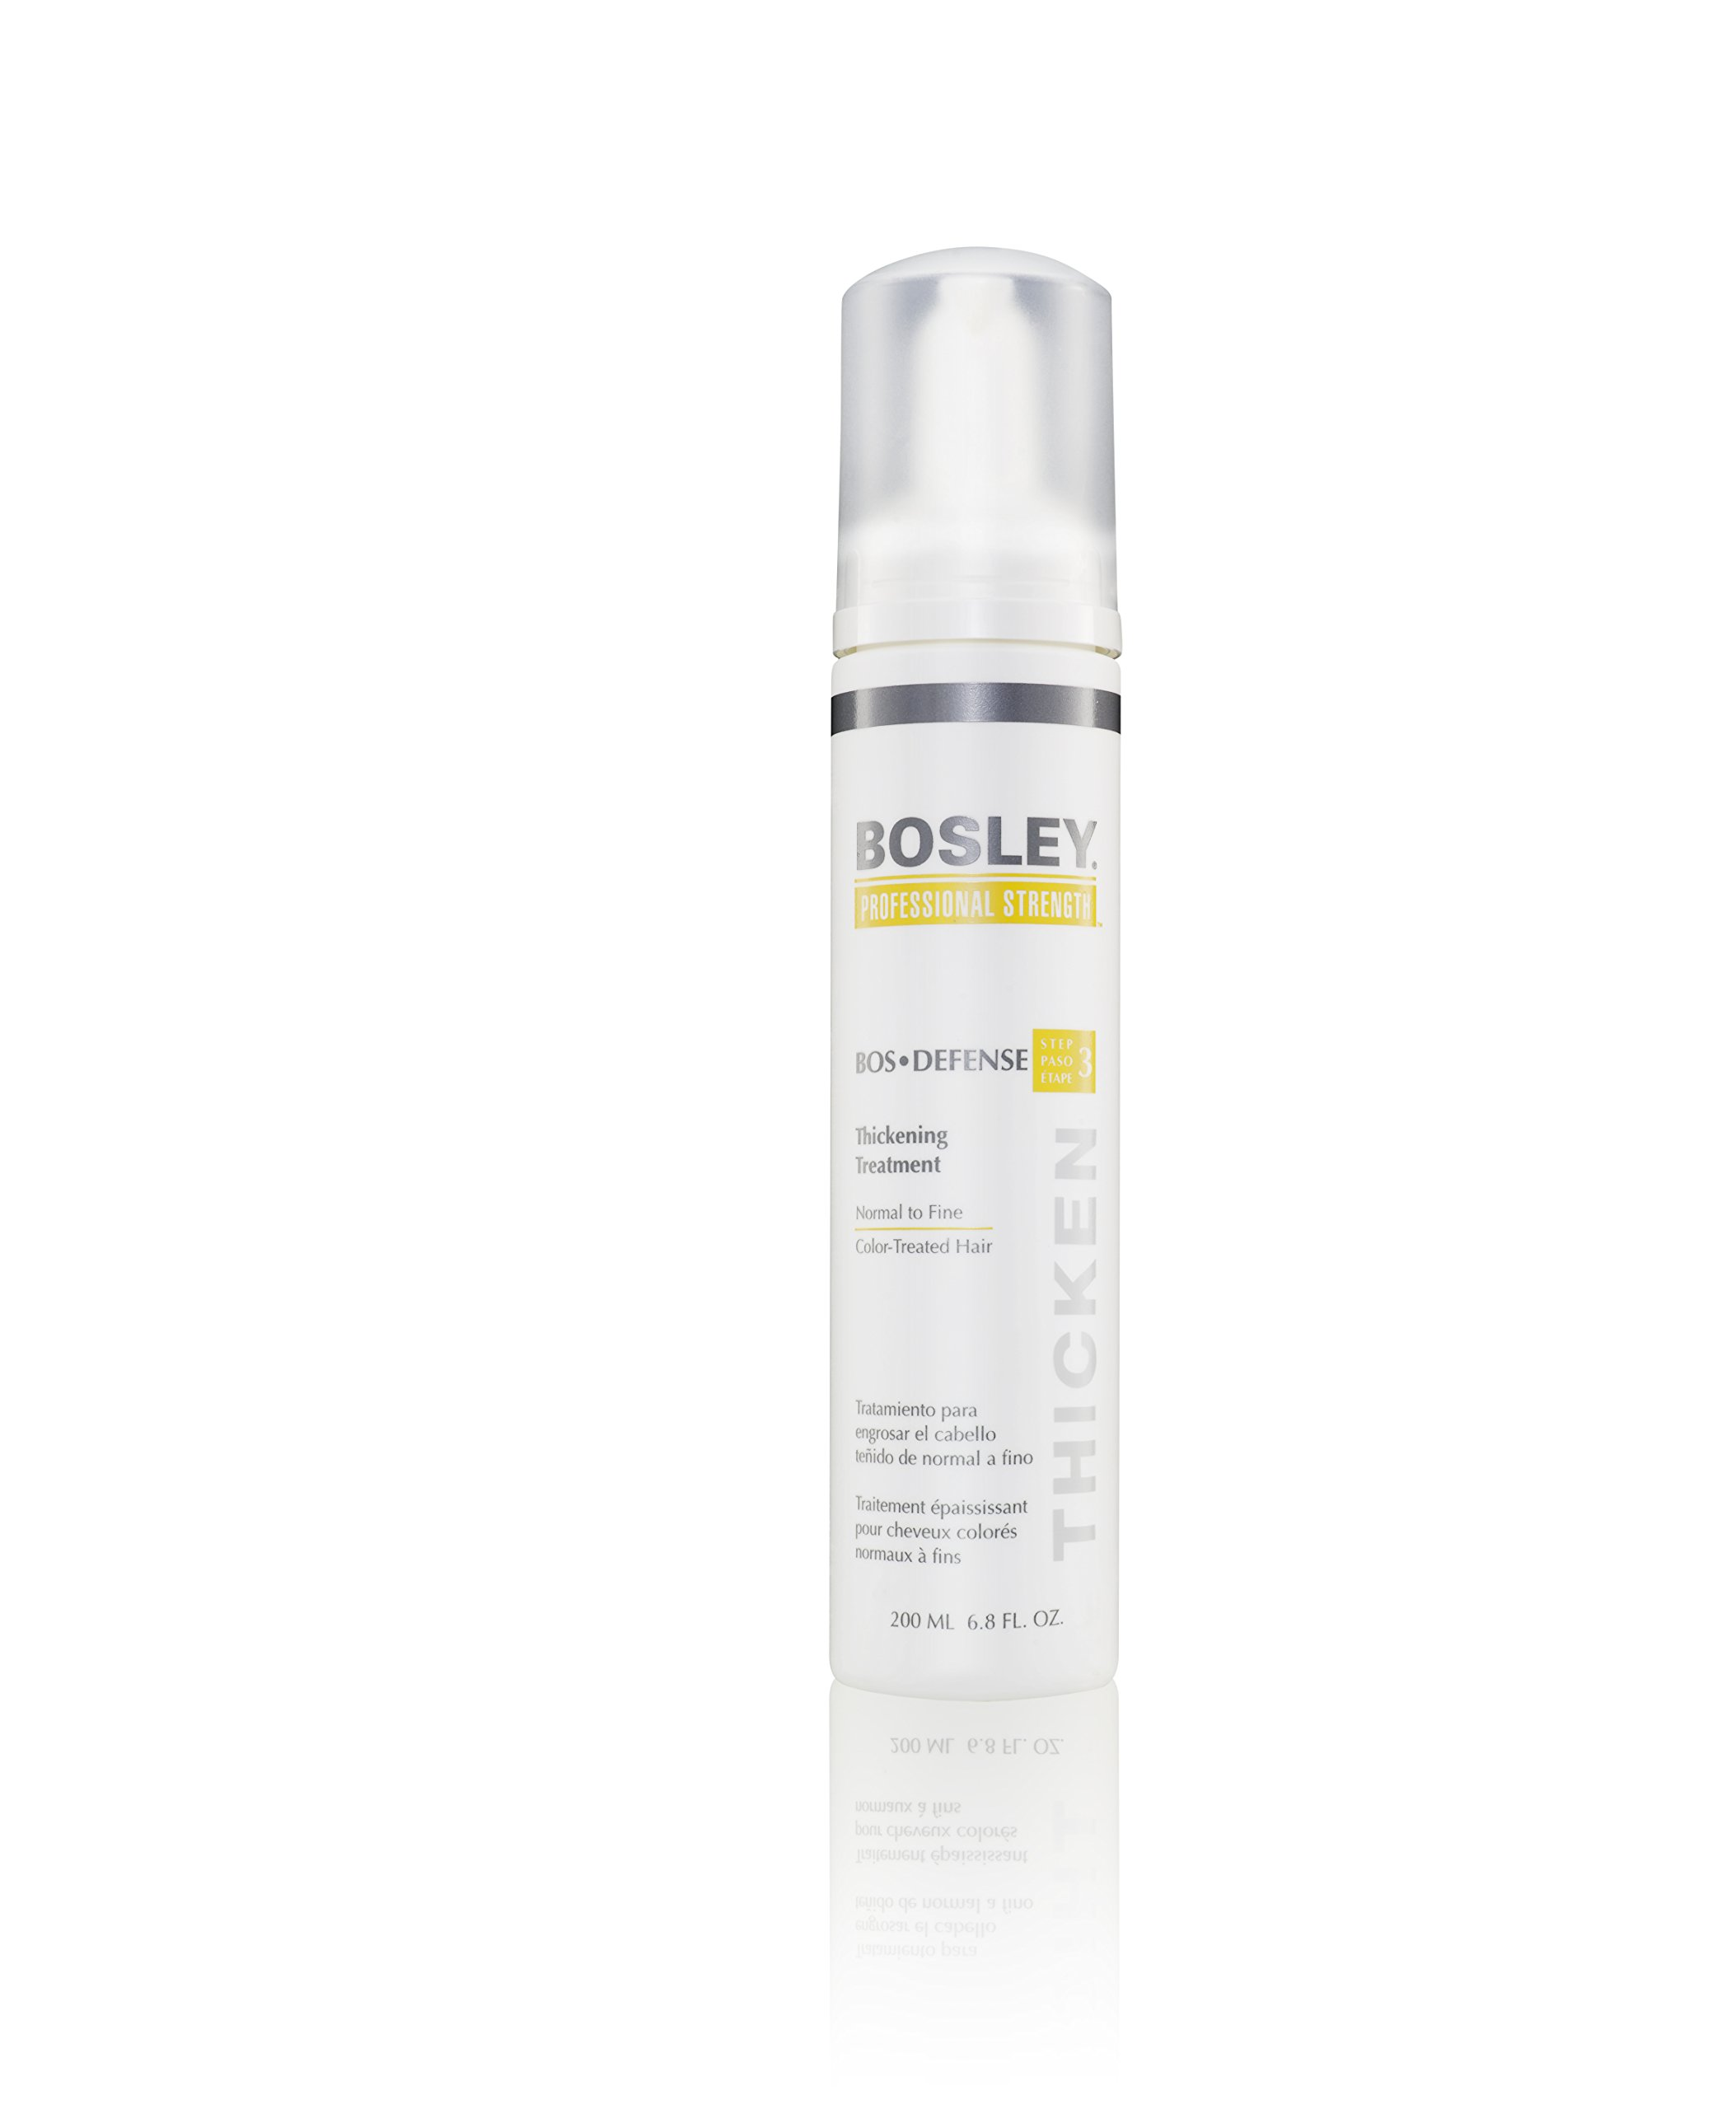 Bosley Professional Strength Bosdefense Treatment For Color-Treated Hair, 6.8 oz